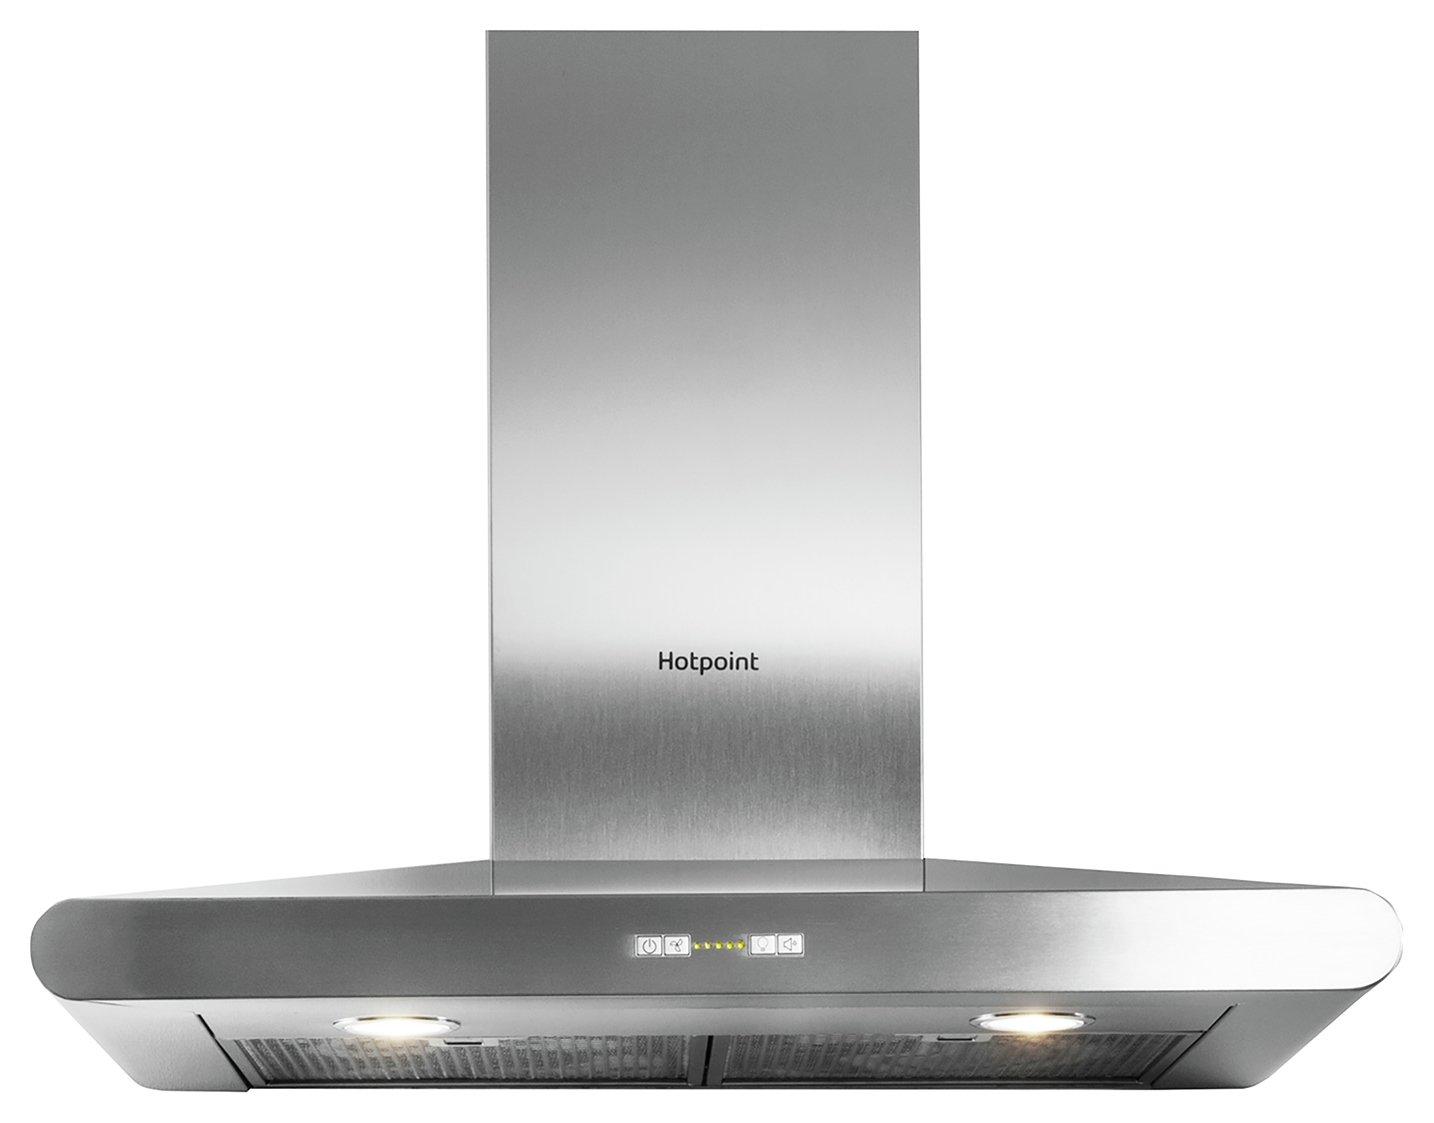 Hotpoint PHC7.7FLBIX 70cm Cooker Hood review